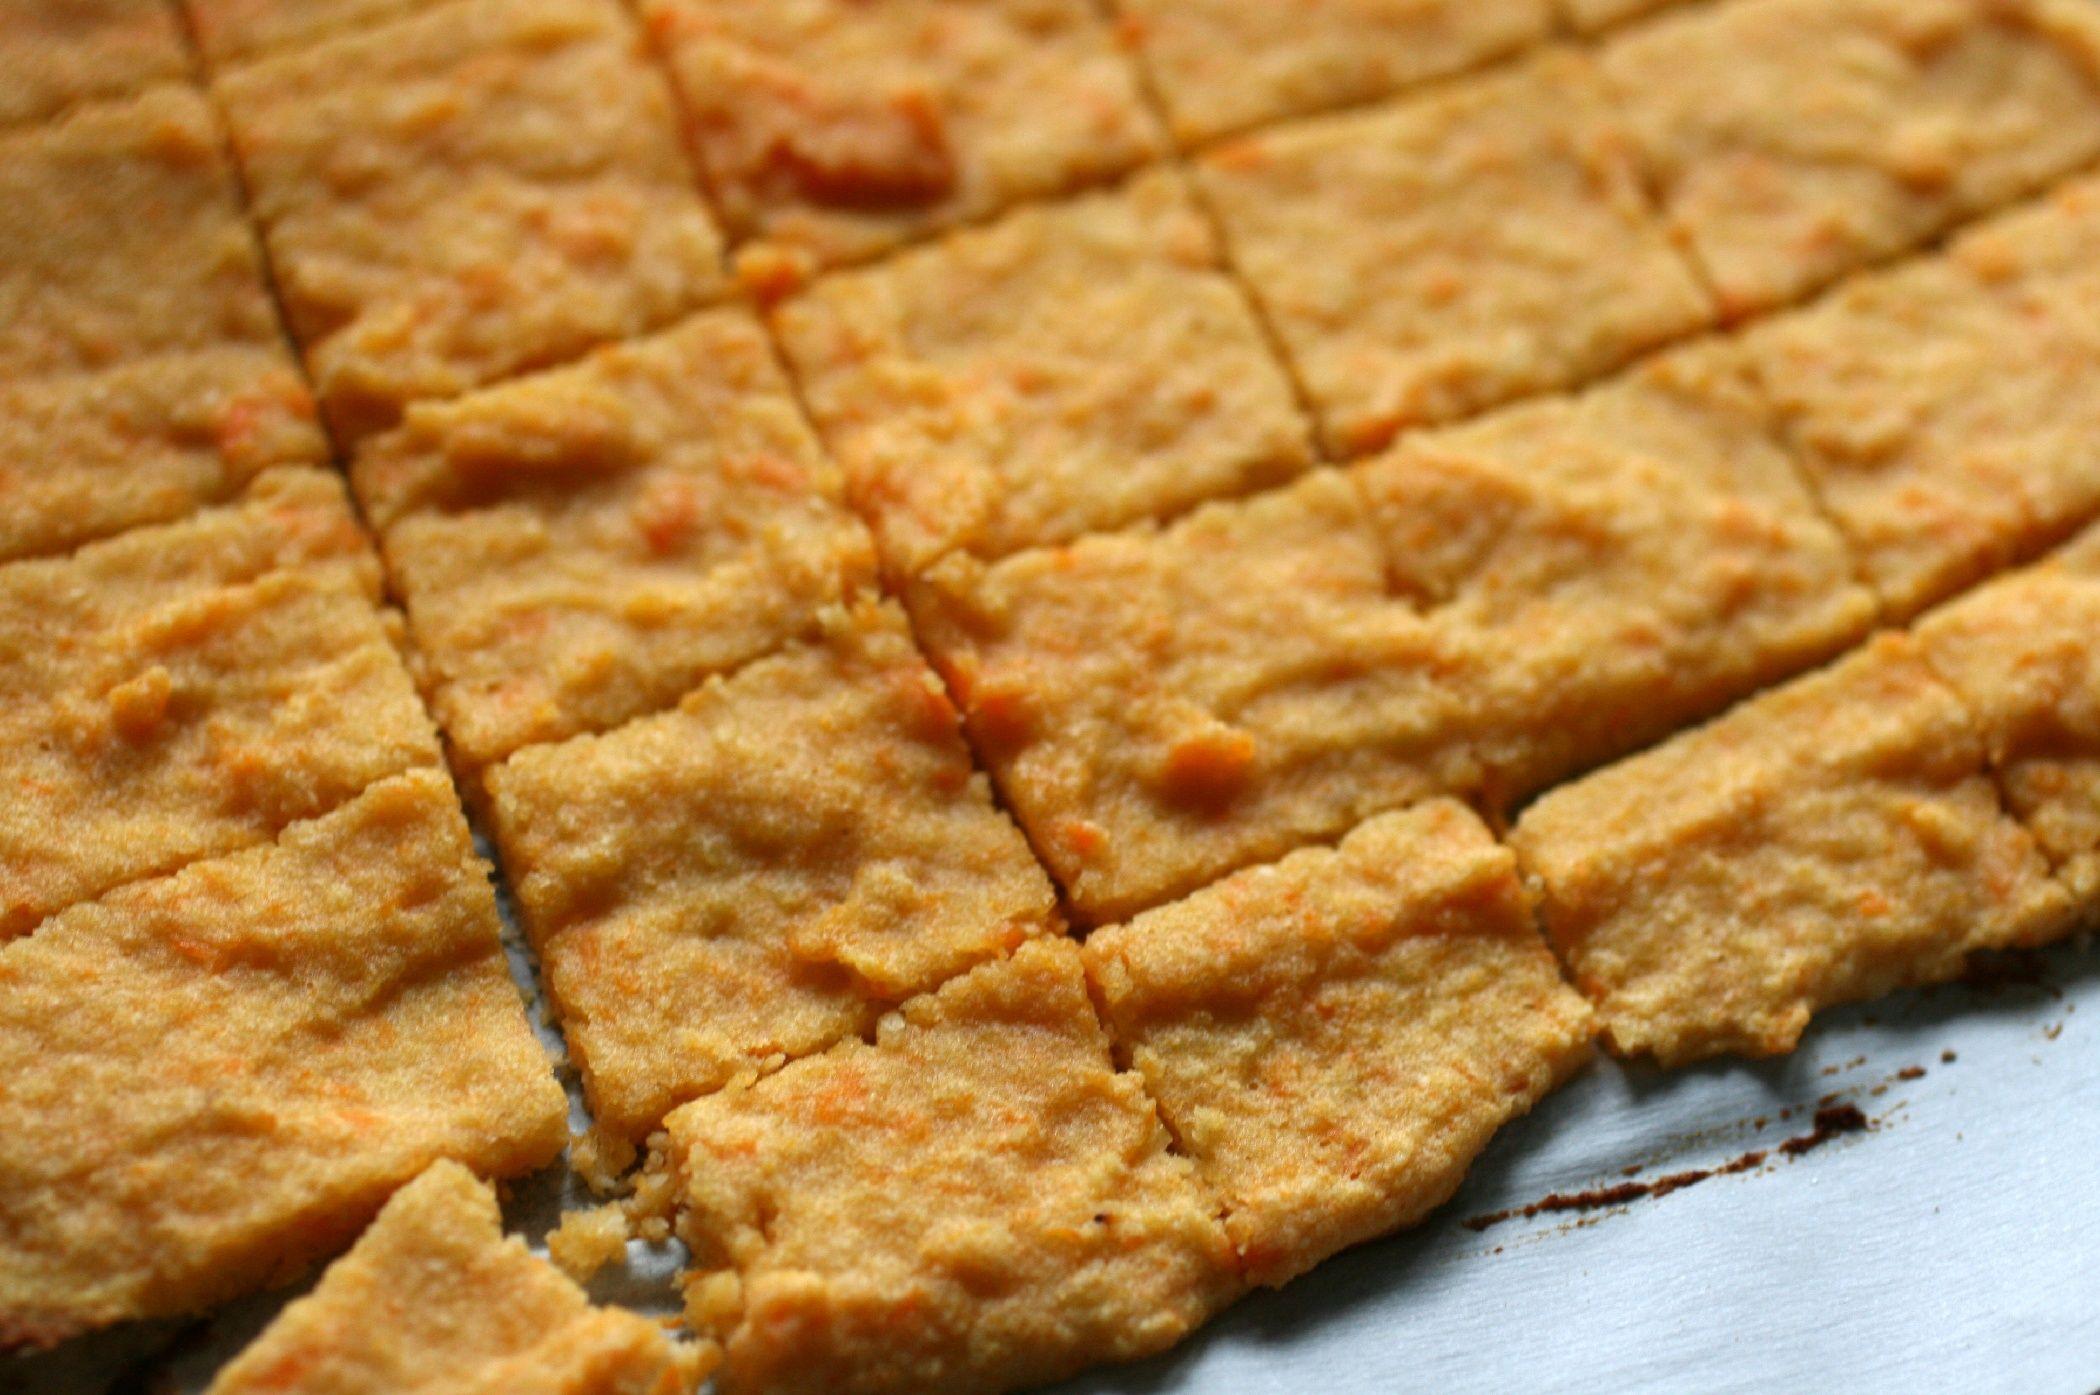 Grain Free Dog Treats Coconut Flour Soft Chews Dog Food Recipes